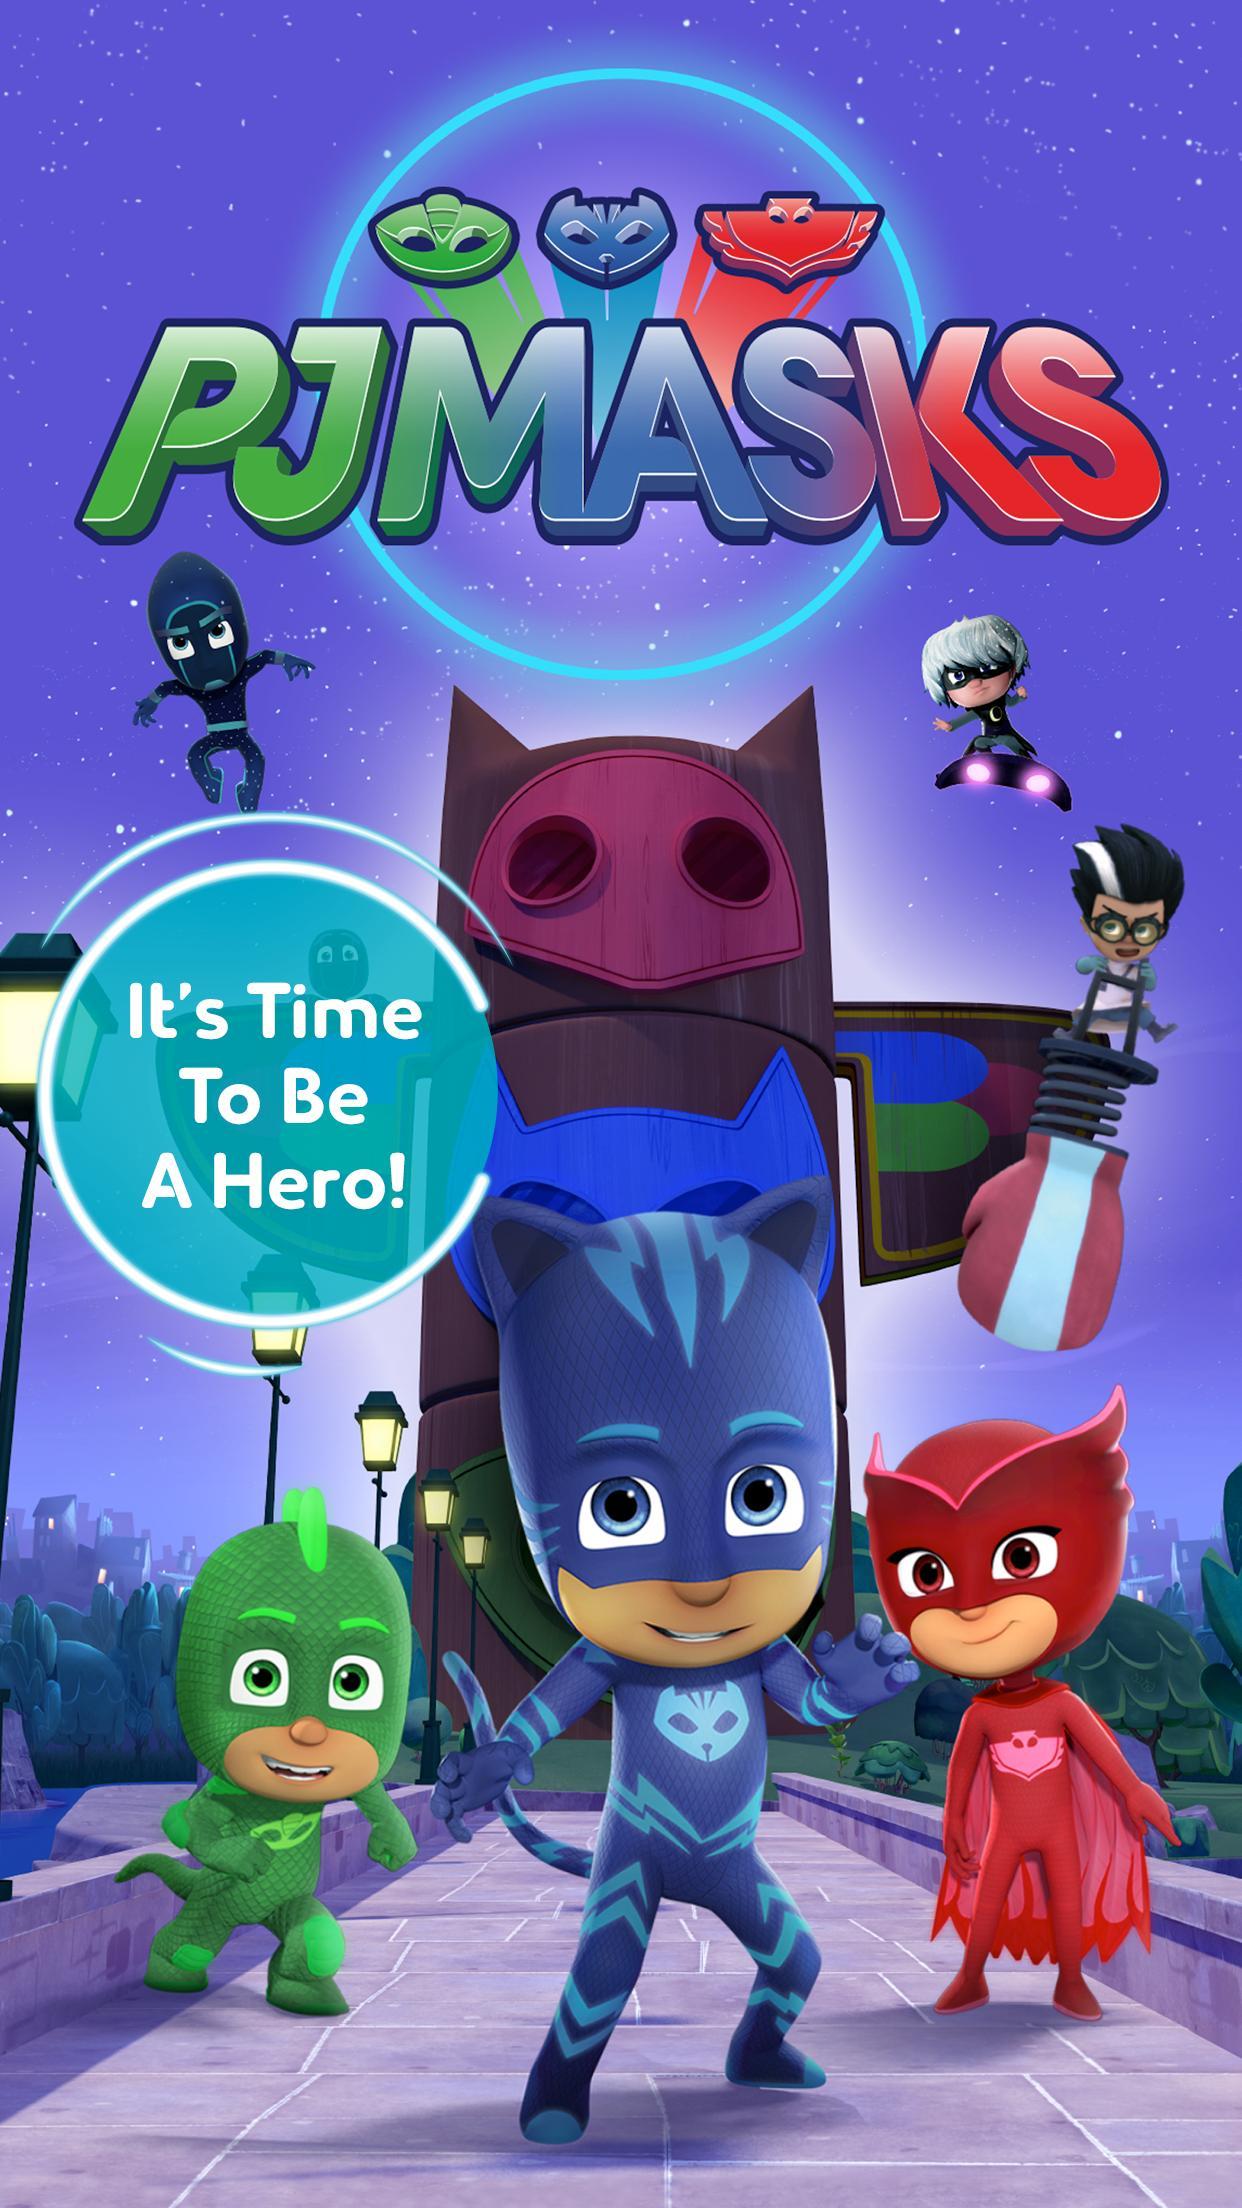 PJ Masks Time To Be A Hero 2.1.2 Screenshot 1